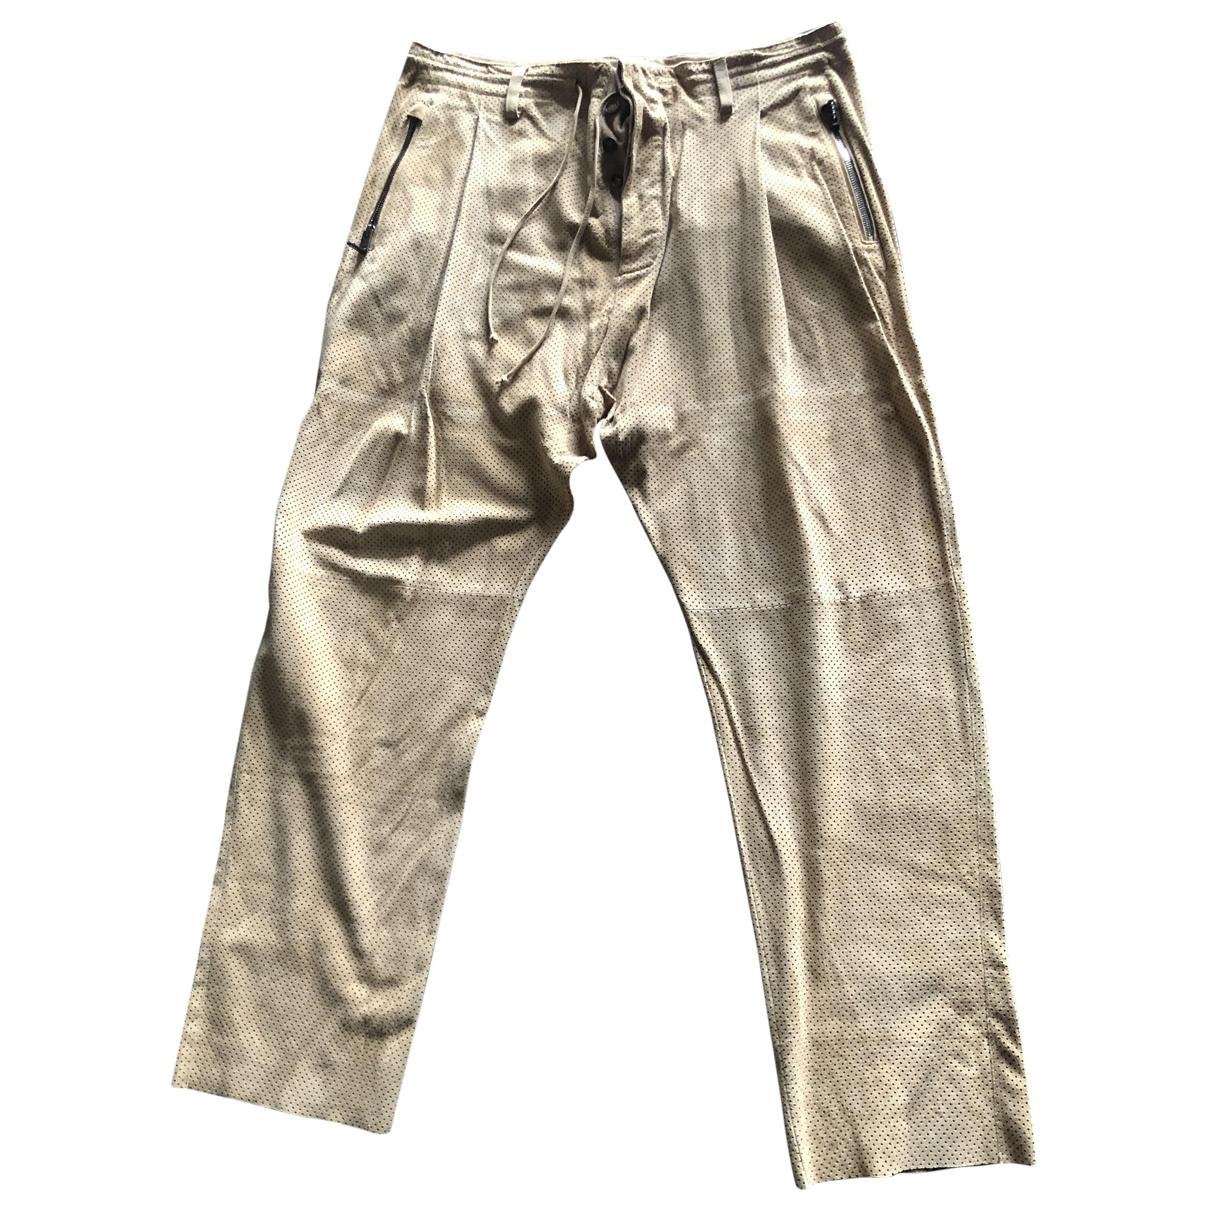 Roberto Cavalli \N Beige Leather Trousers for Men L International